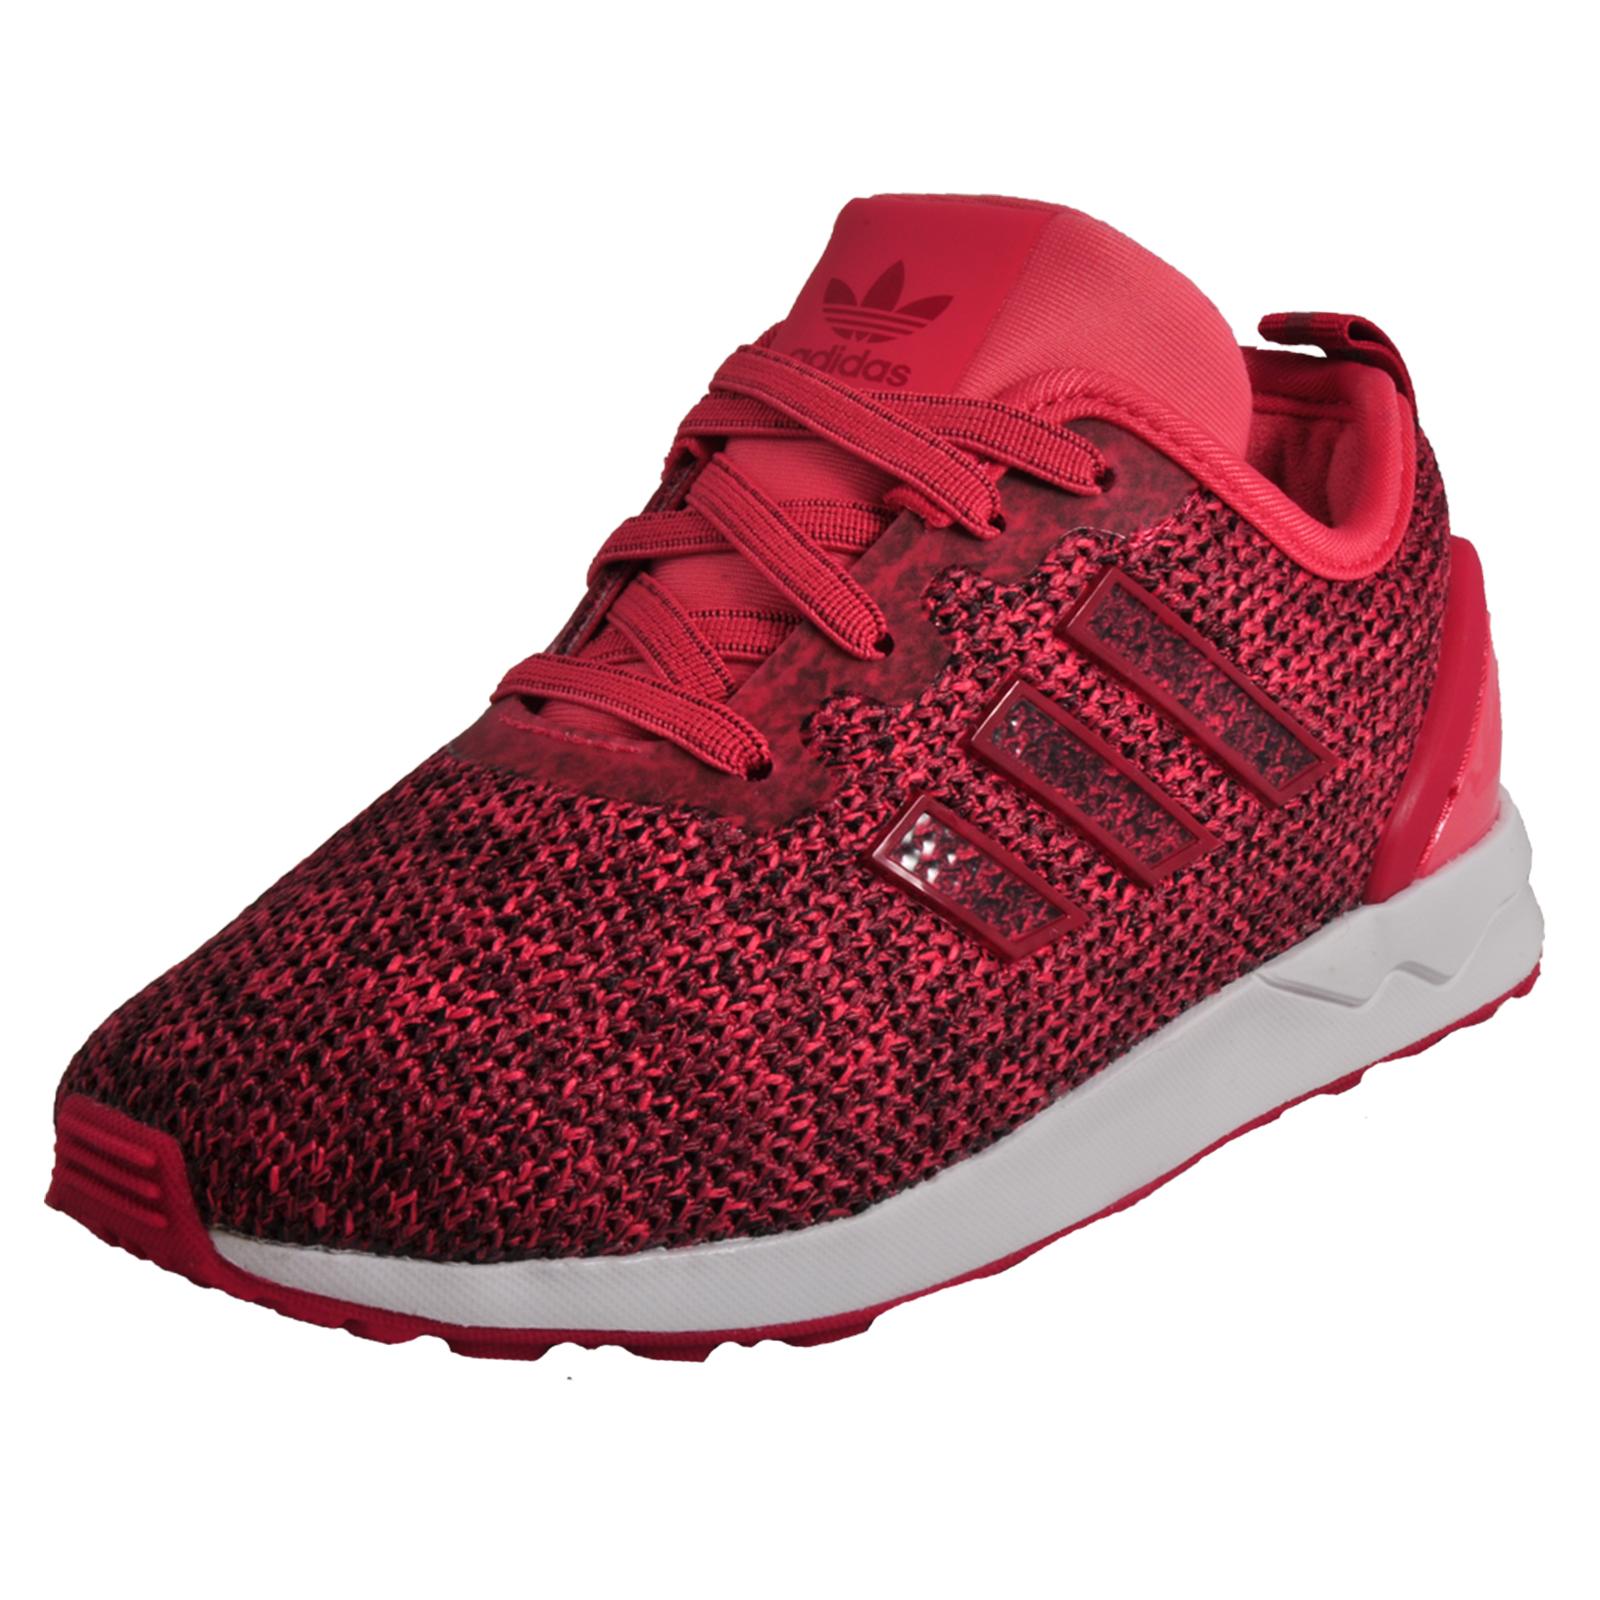 save off 6445c afd49 ... spain adidas originals zx flux adv el infants casual classic trainers  pink 1809c ebb10